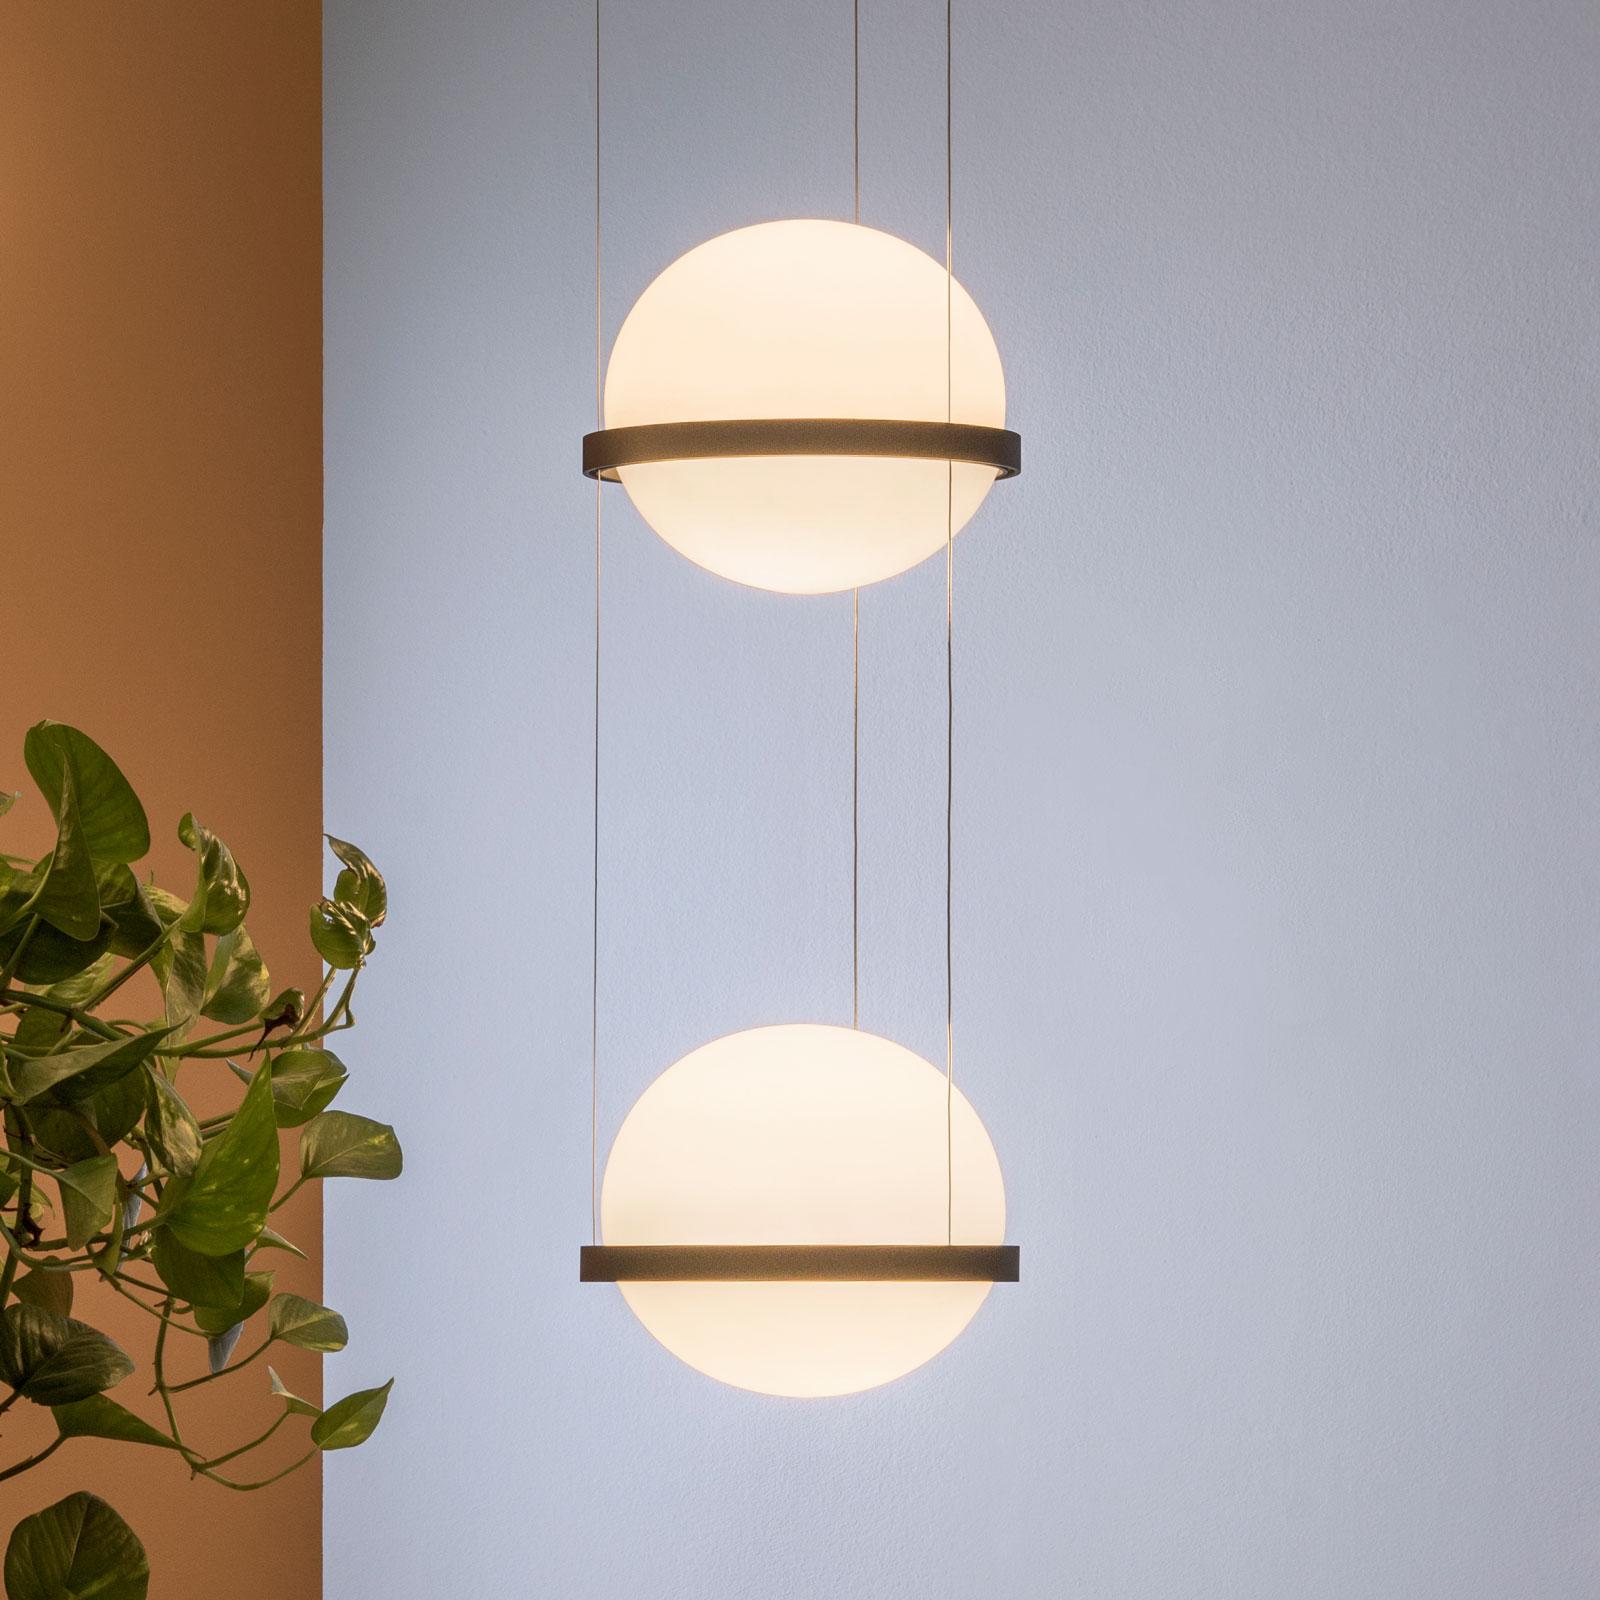 Vibia Palma 3726 lampa wisząca LED 2-pkt., grafit